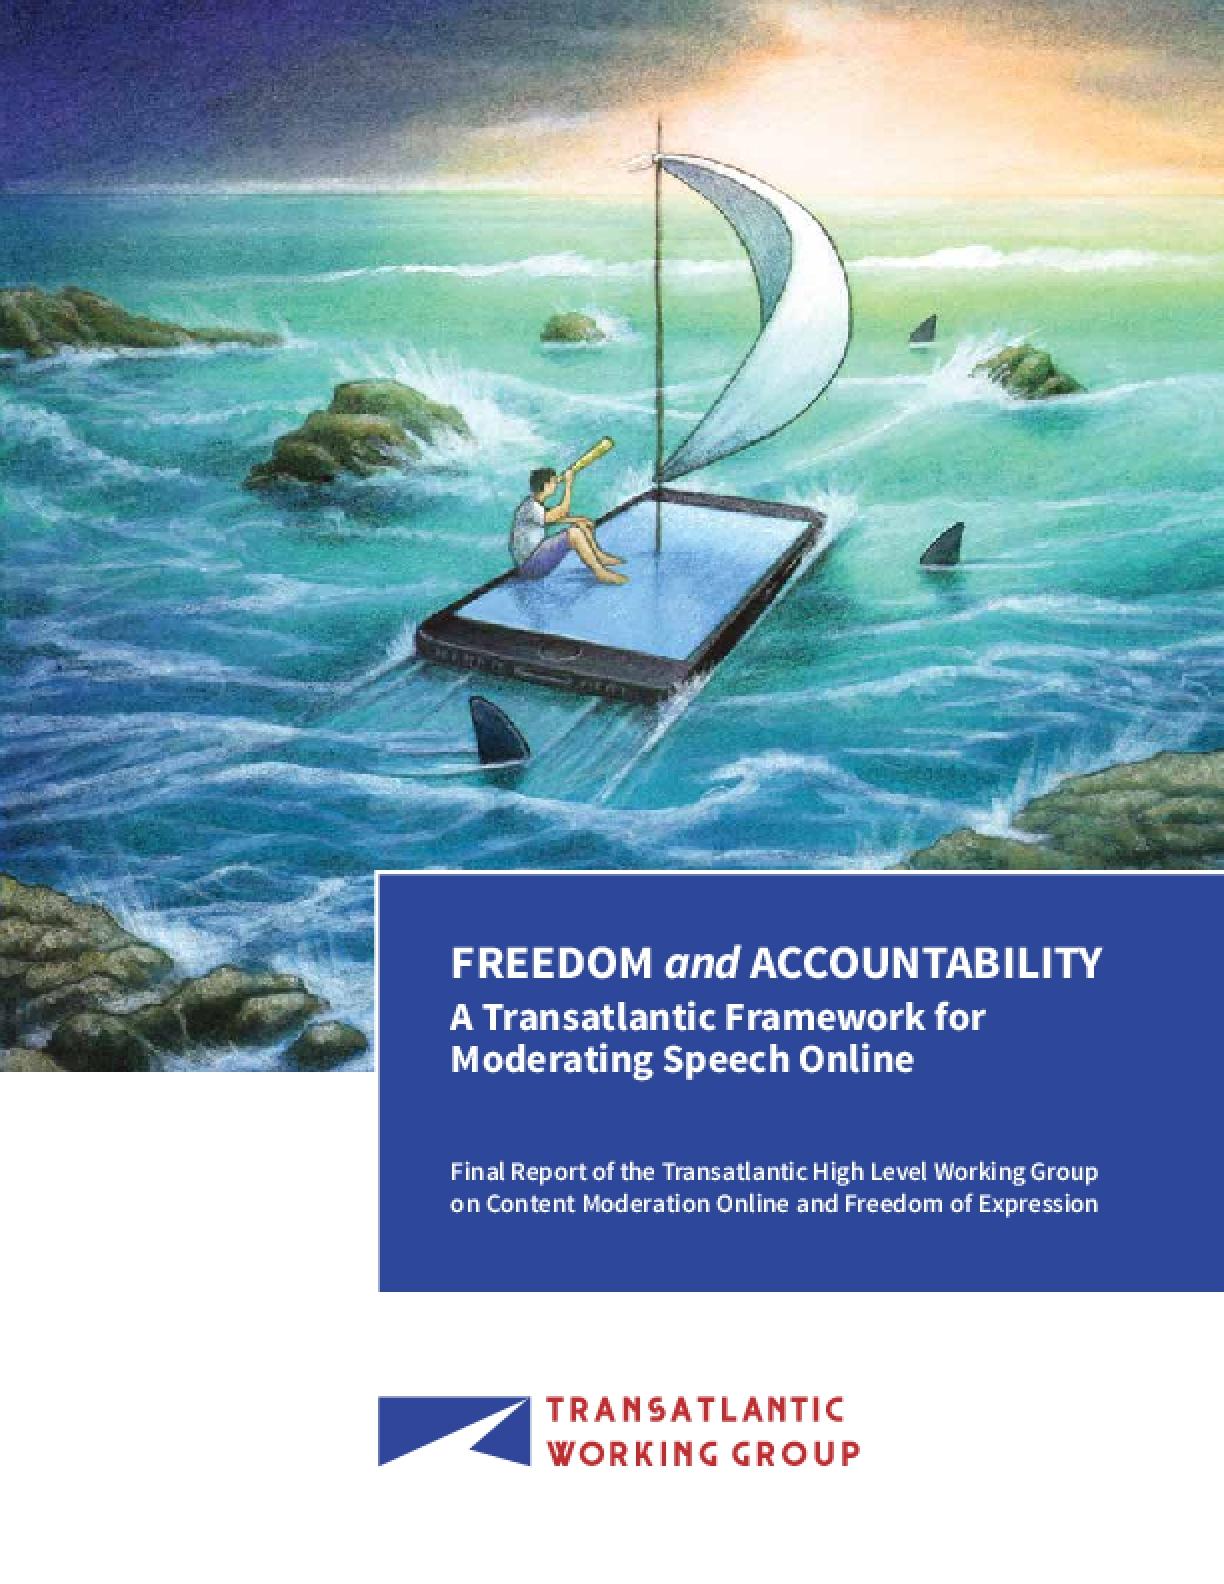 Freedom and Accountability: A Transatlantic Framework for Moderating Speech Online